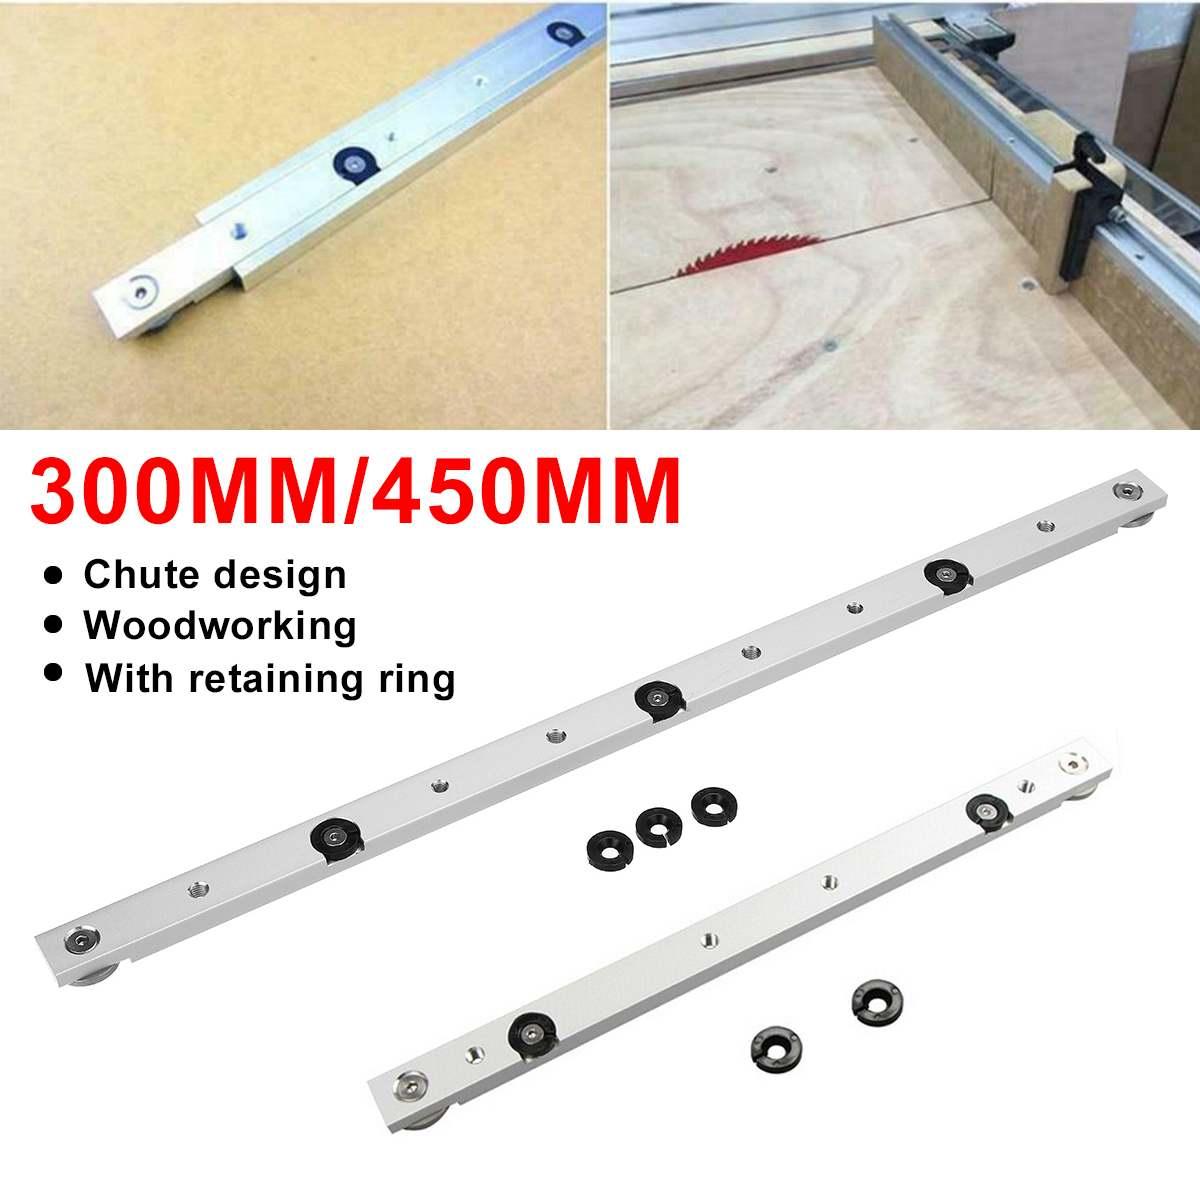 30/45cm Tool Adjustment Universal Slider Carving Miter Bar Table Saw Gauge Rod Aluminum Alloy Woodworking Rail Table Gauge Tool